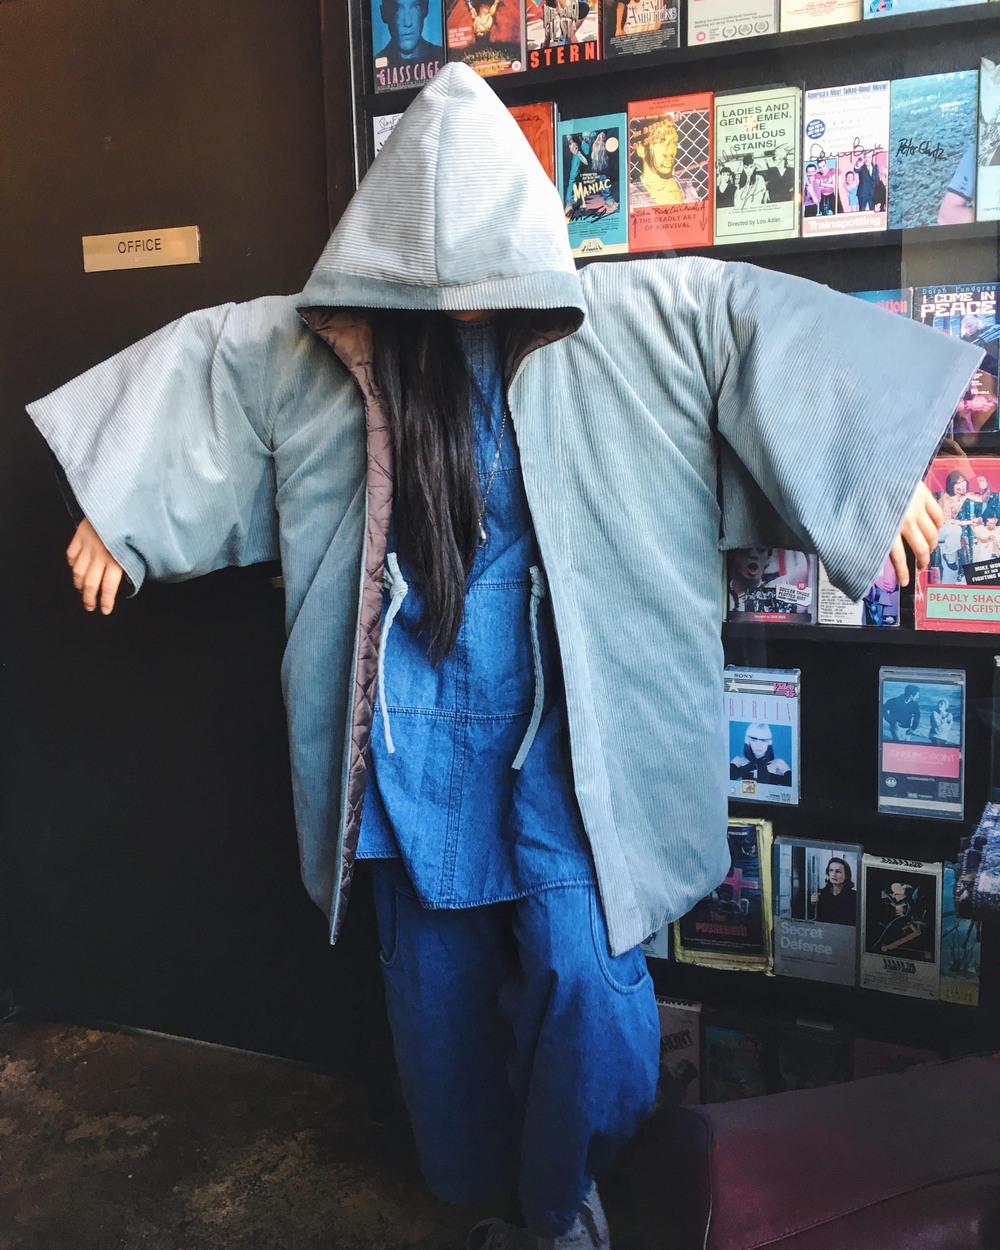 Vaevae in her Hooded Haori Kimono